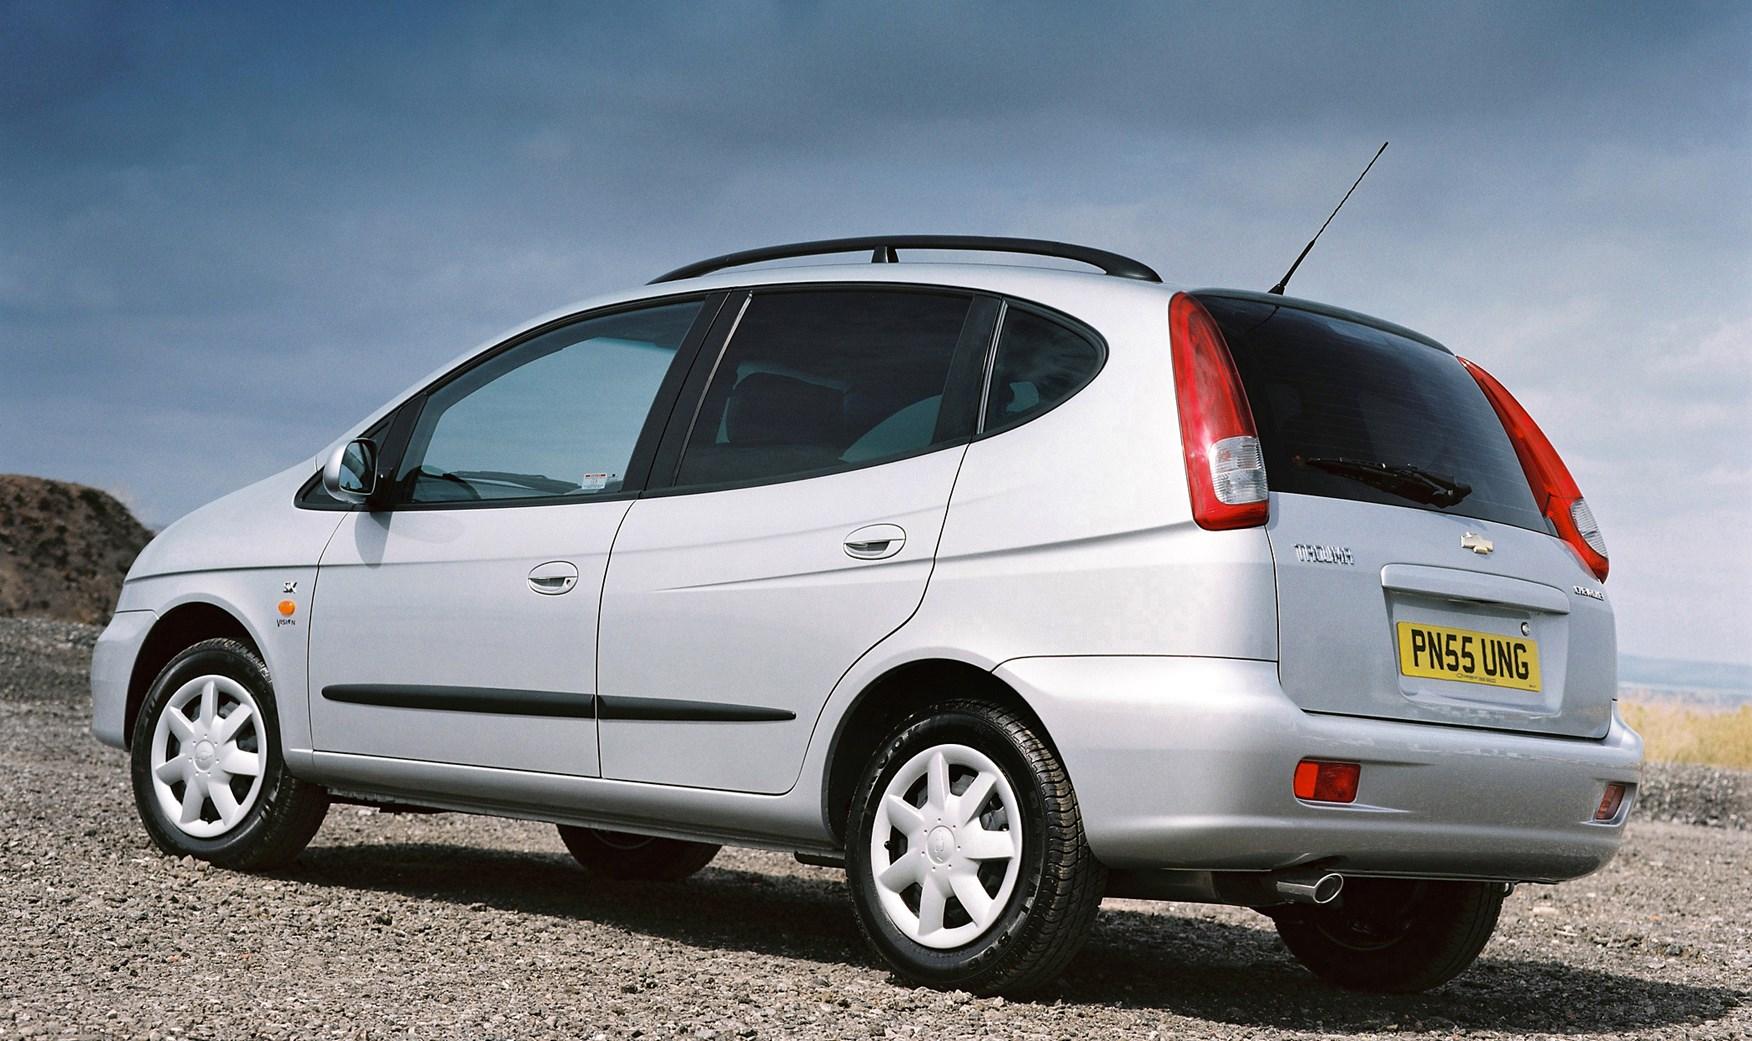 Chevrolet Tacuma I 2000 - 2008 Compact MPV #1